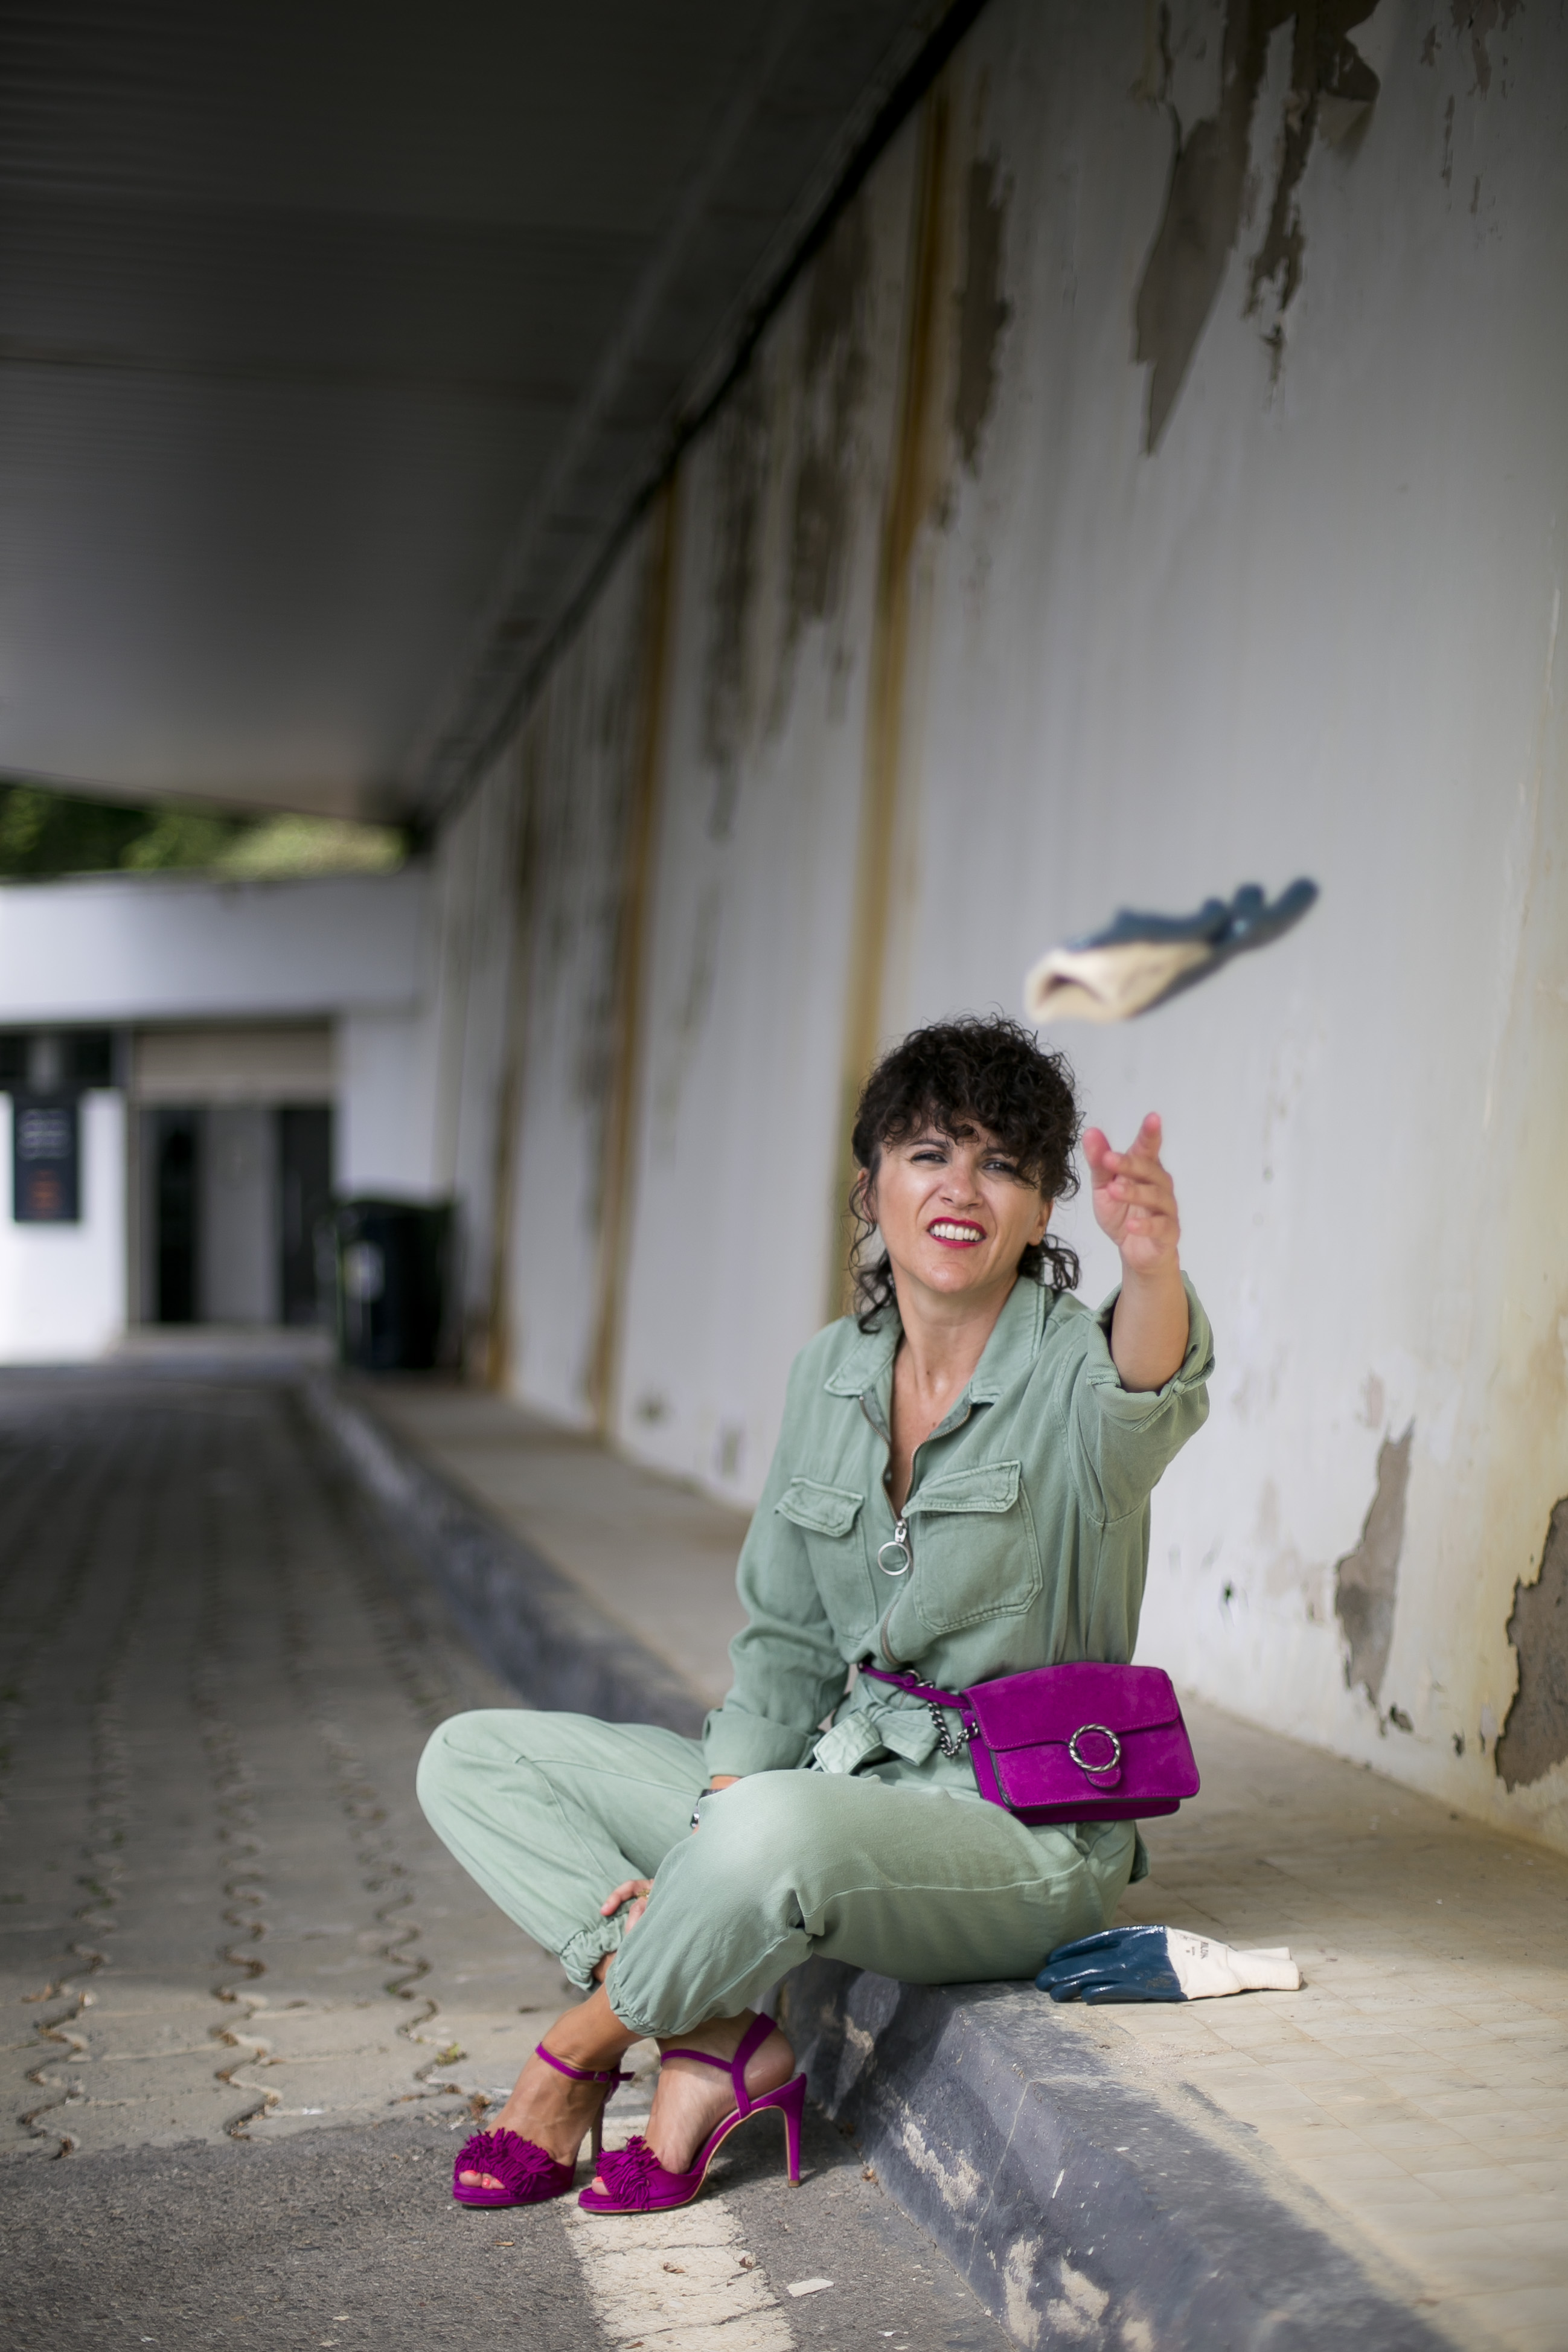 Rebeca Valdivia, asesora de imagen, personal shopper, influencer, Donostia, San Sebastián, Miss Clov, la blogger indie, Donostia, street style, ootd, moño, buzo, mono, jumpsuit, heels, sandals, sandalias de tacón